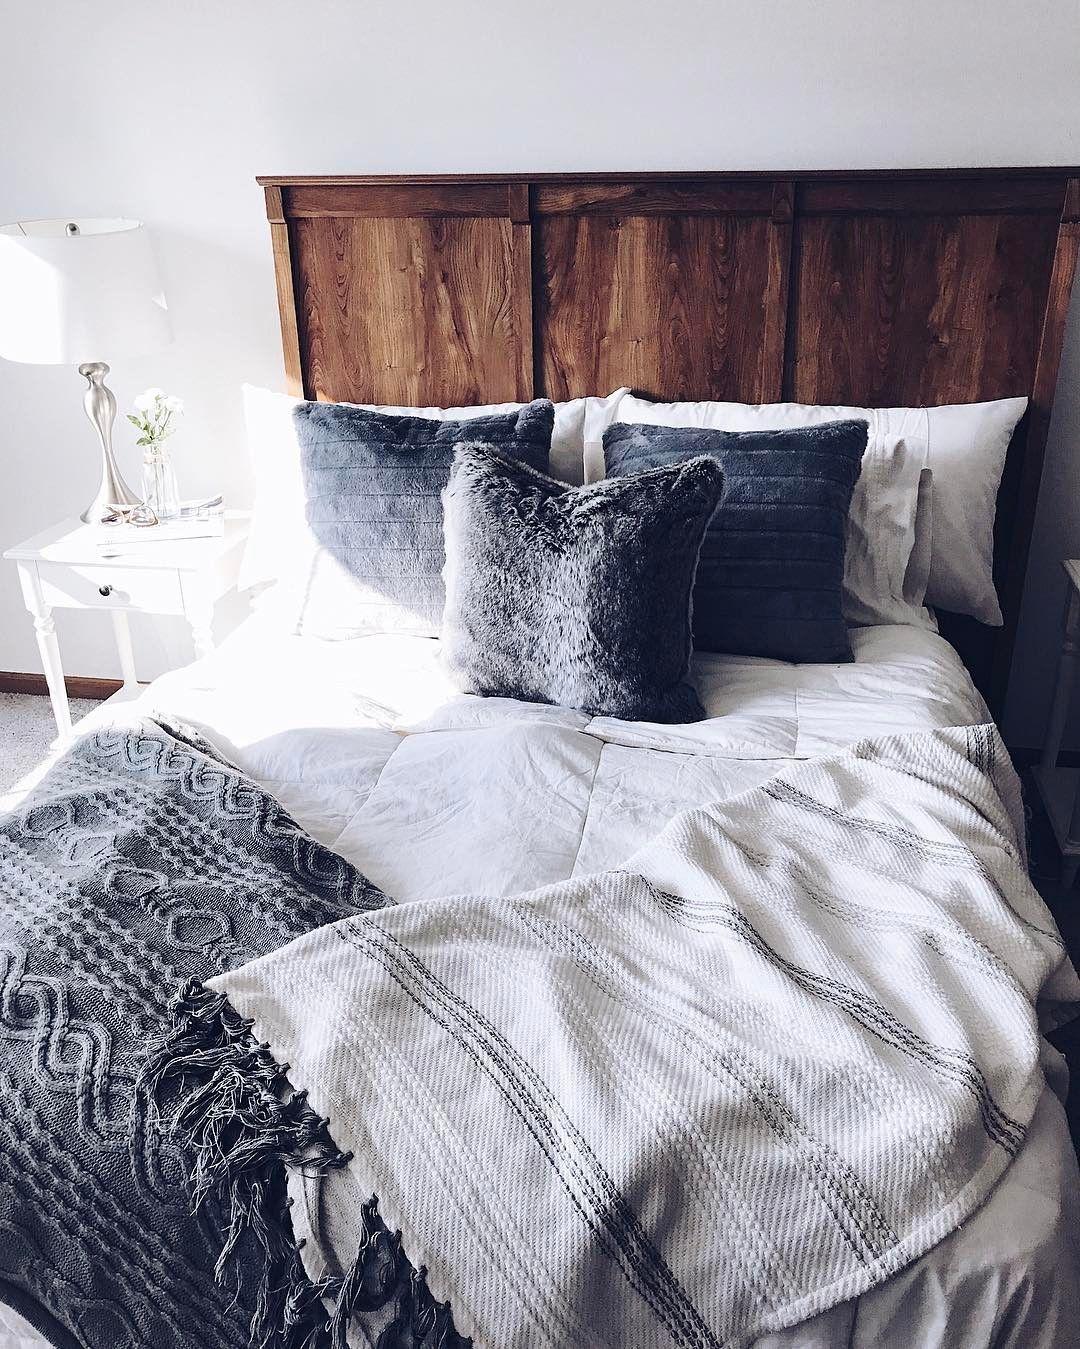 Rustic Grey Bedroom Rustic Grey Bedroom Rustic Bedroom Rustic Bedroom Decor